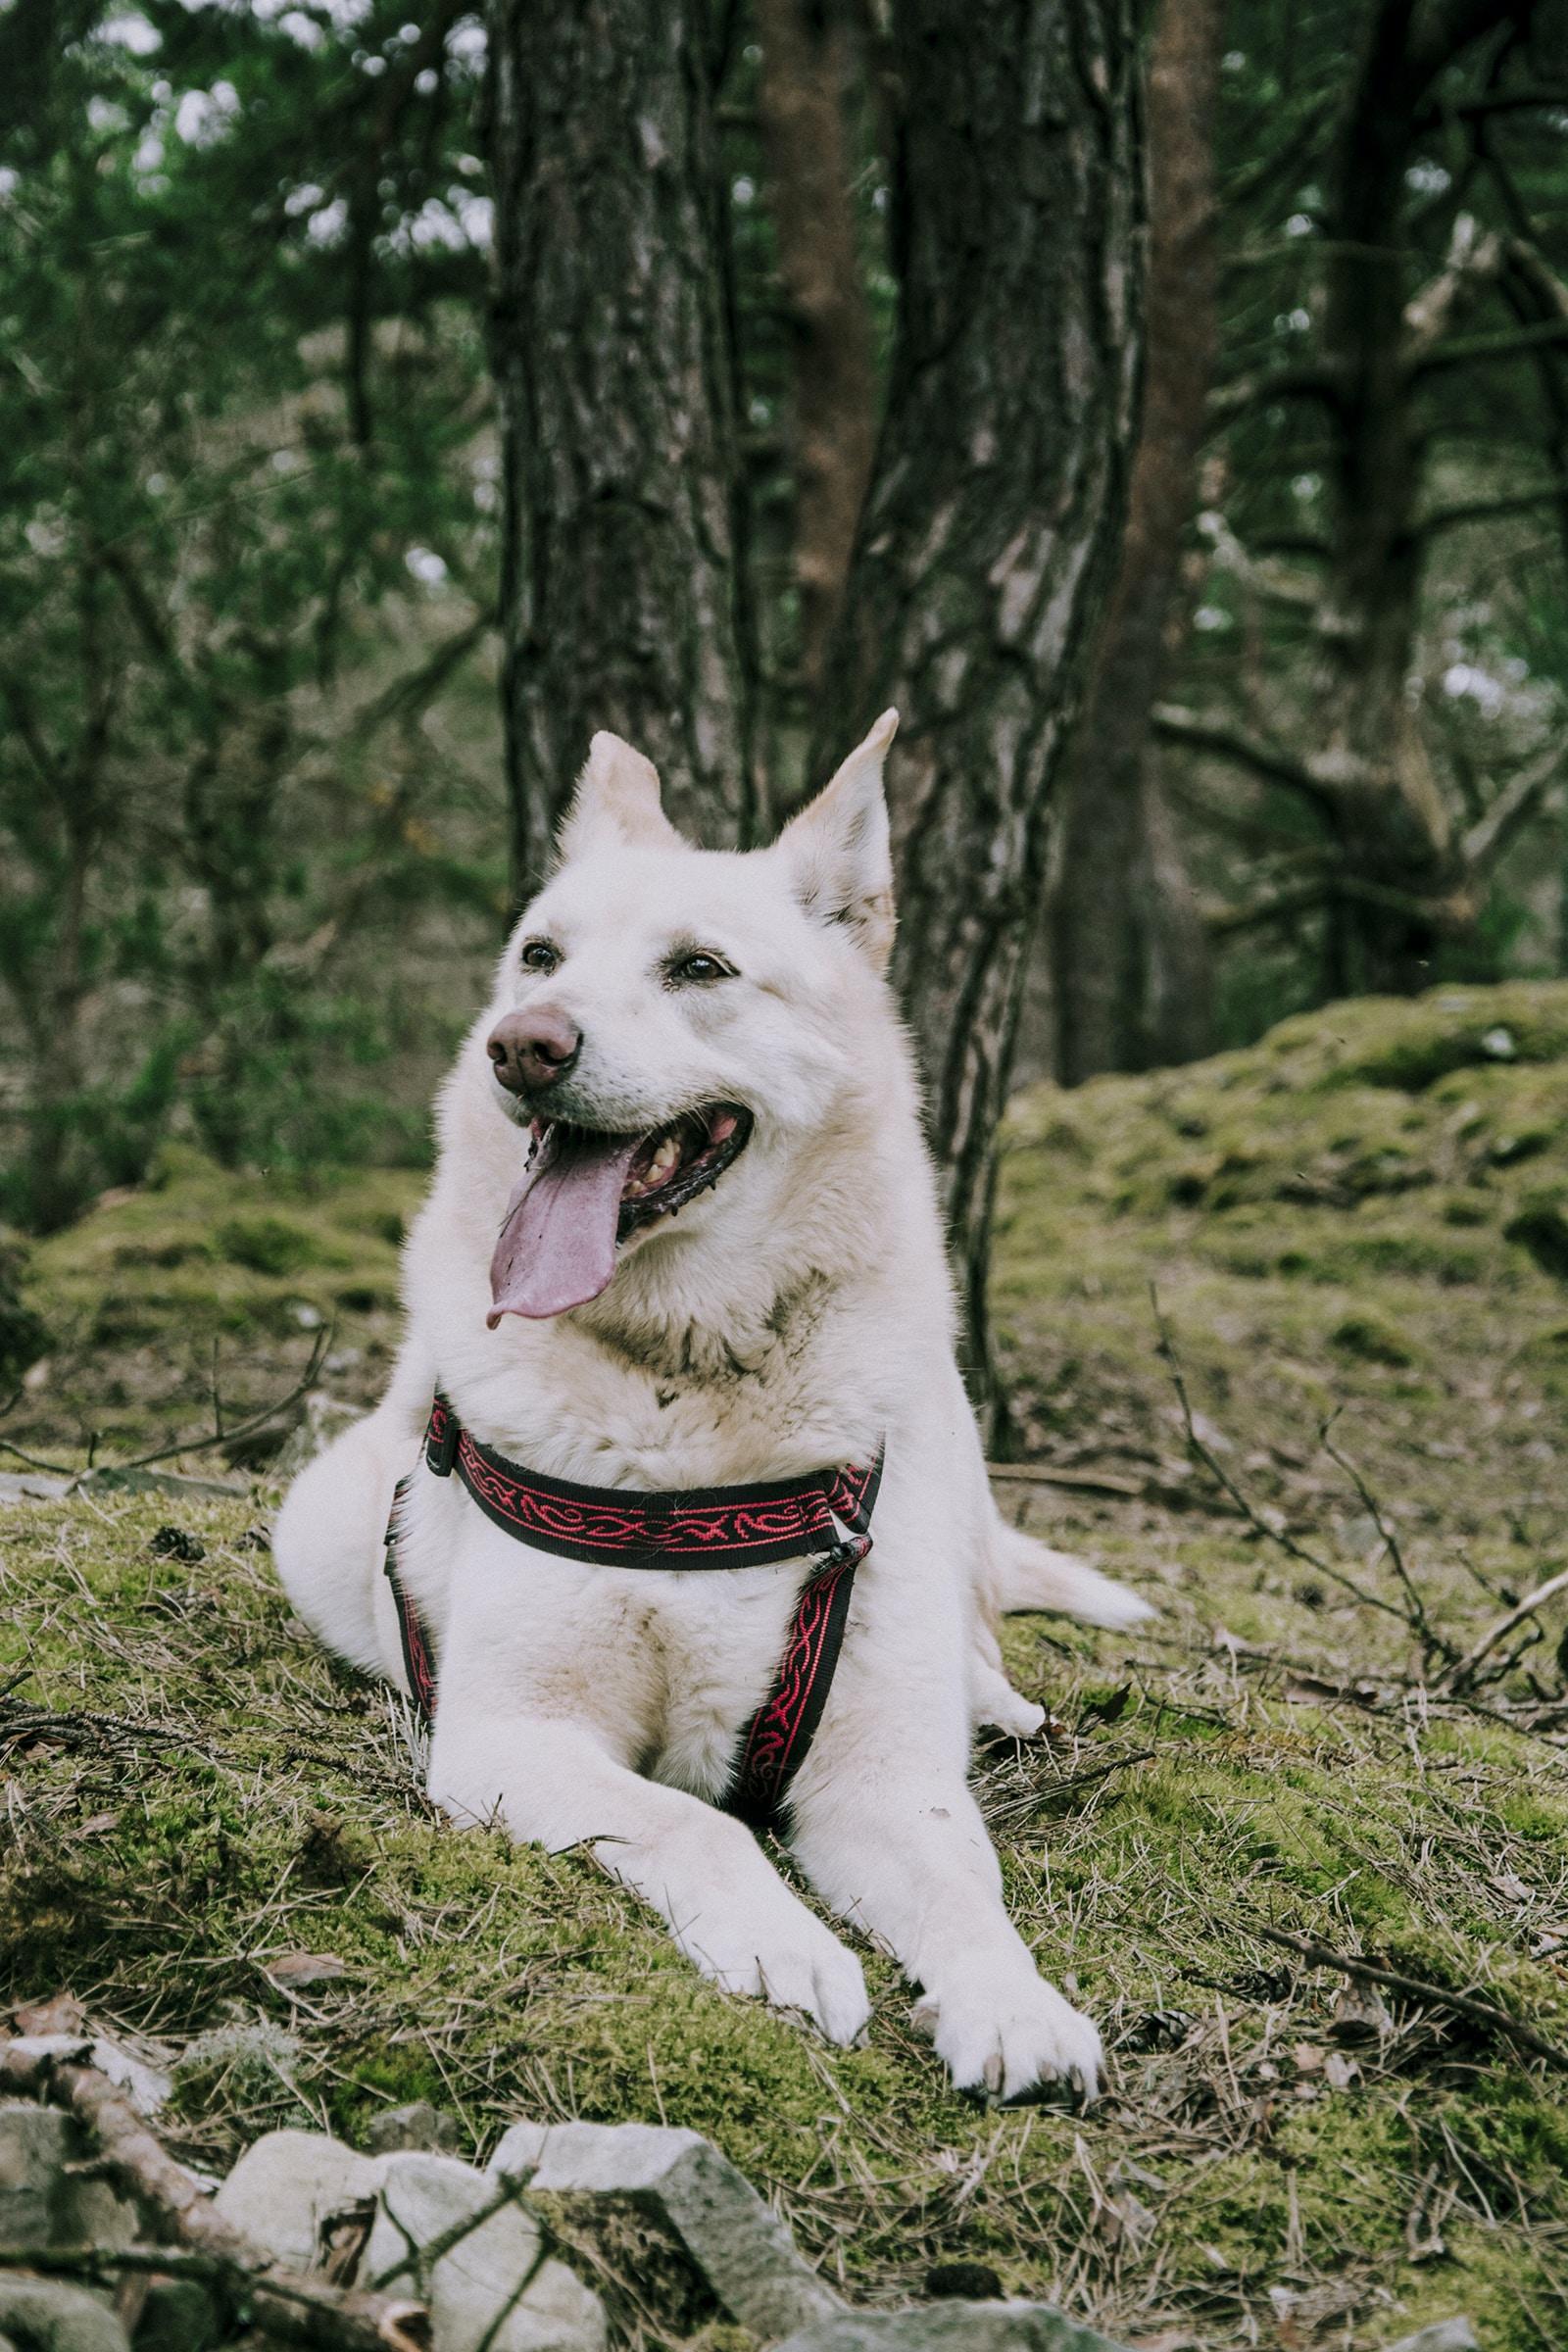 white dog on grass near trees